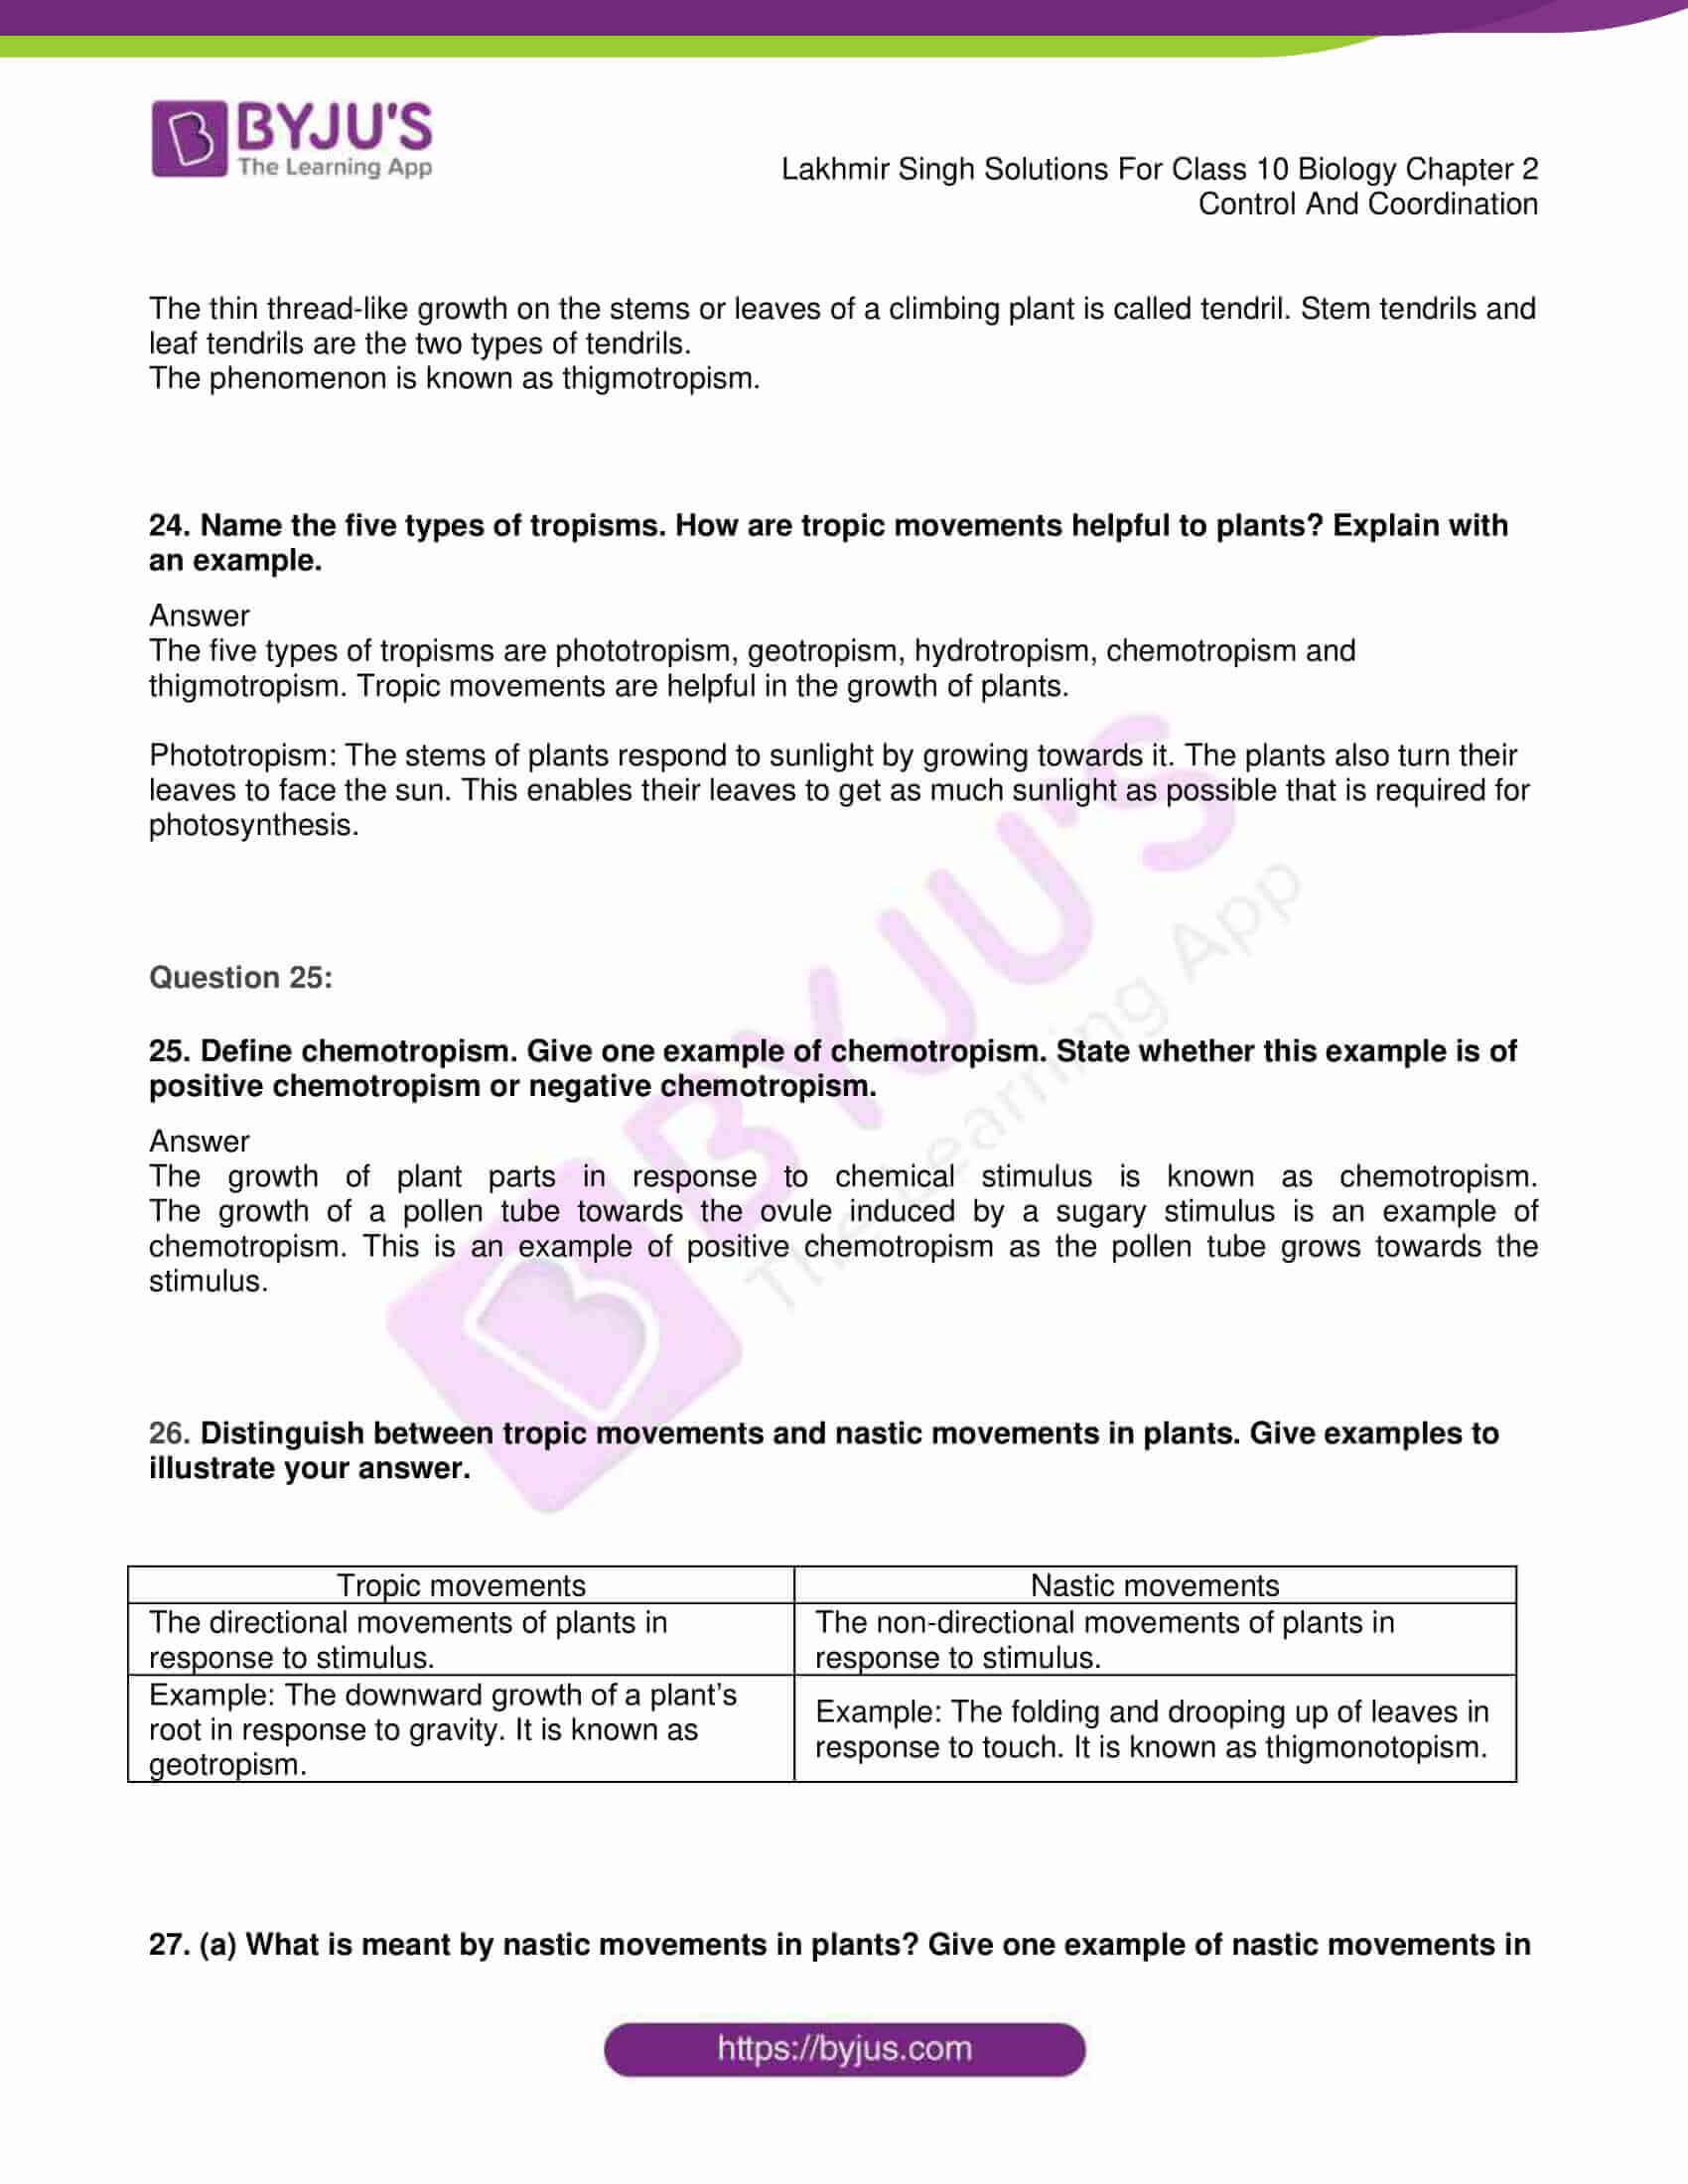 lakhmir singh sol class 10 biology chapter 2 07